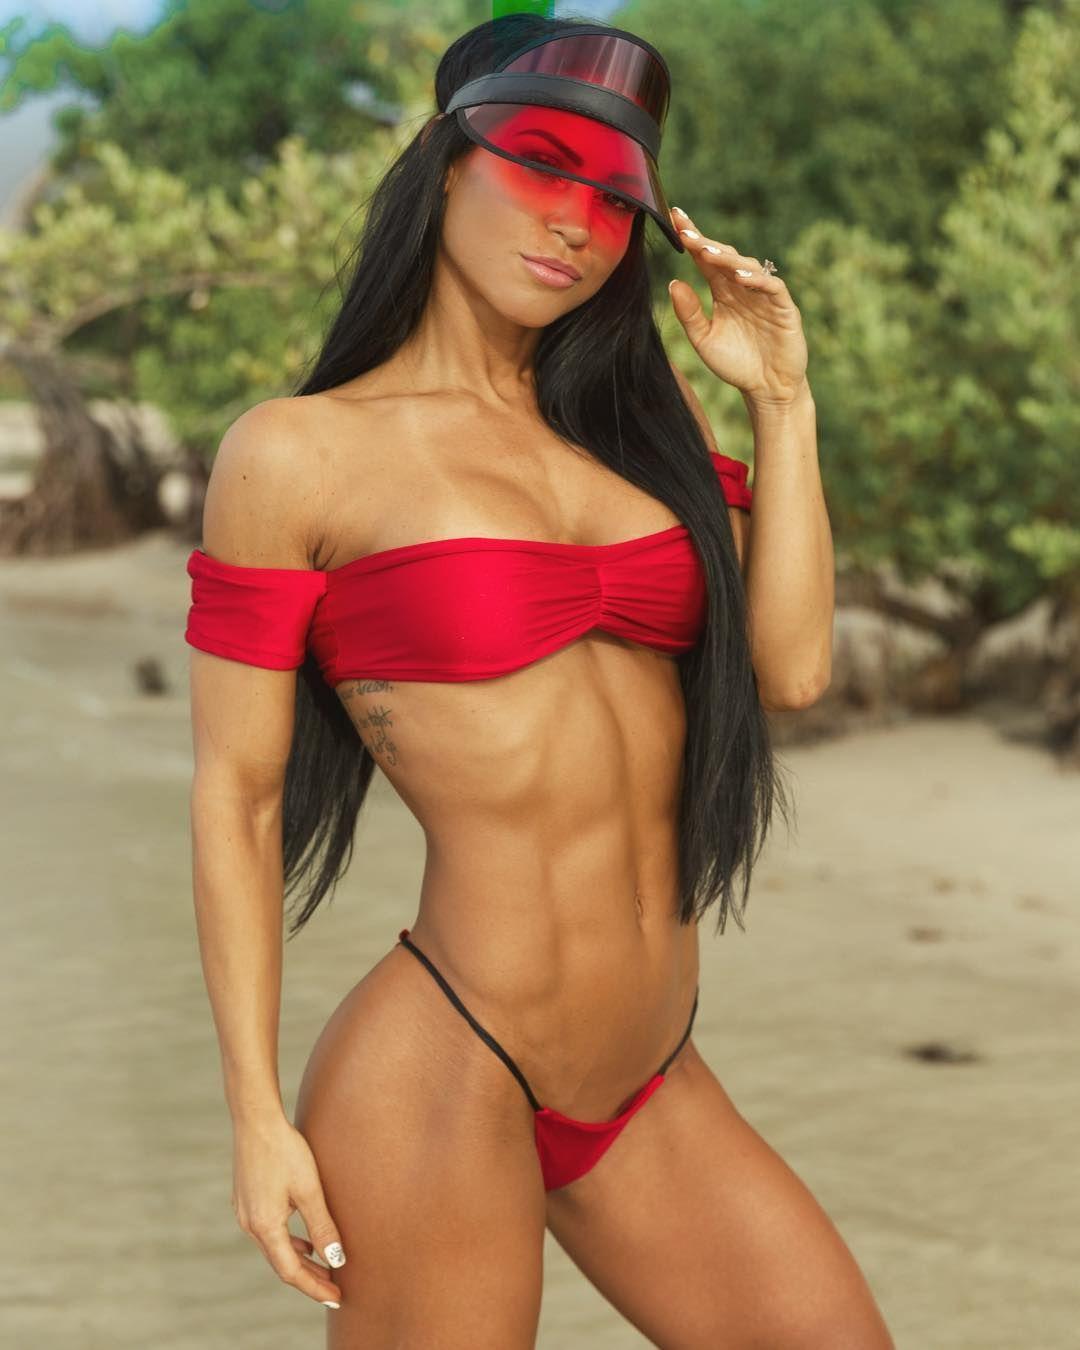 Анита херберт (anita herbert): успехи и титулы фитнес-модели, фото - спортзал